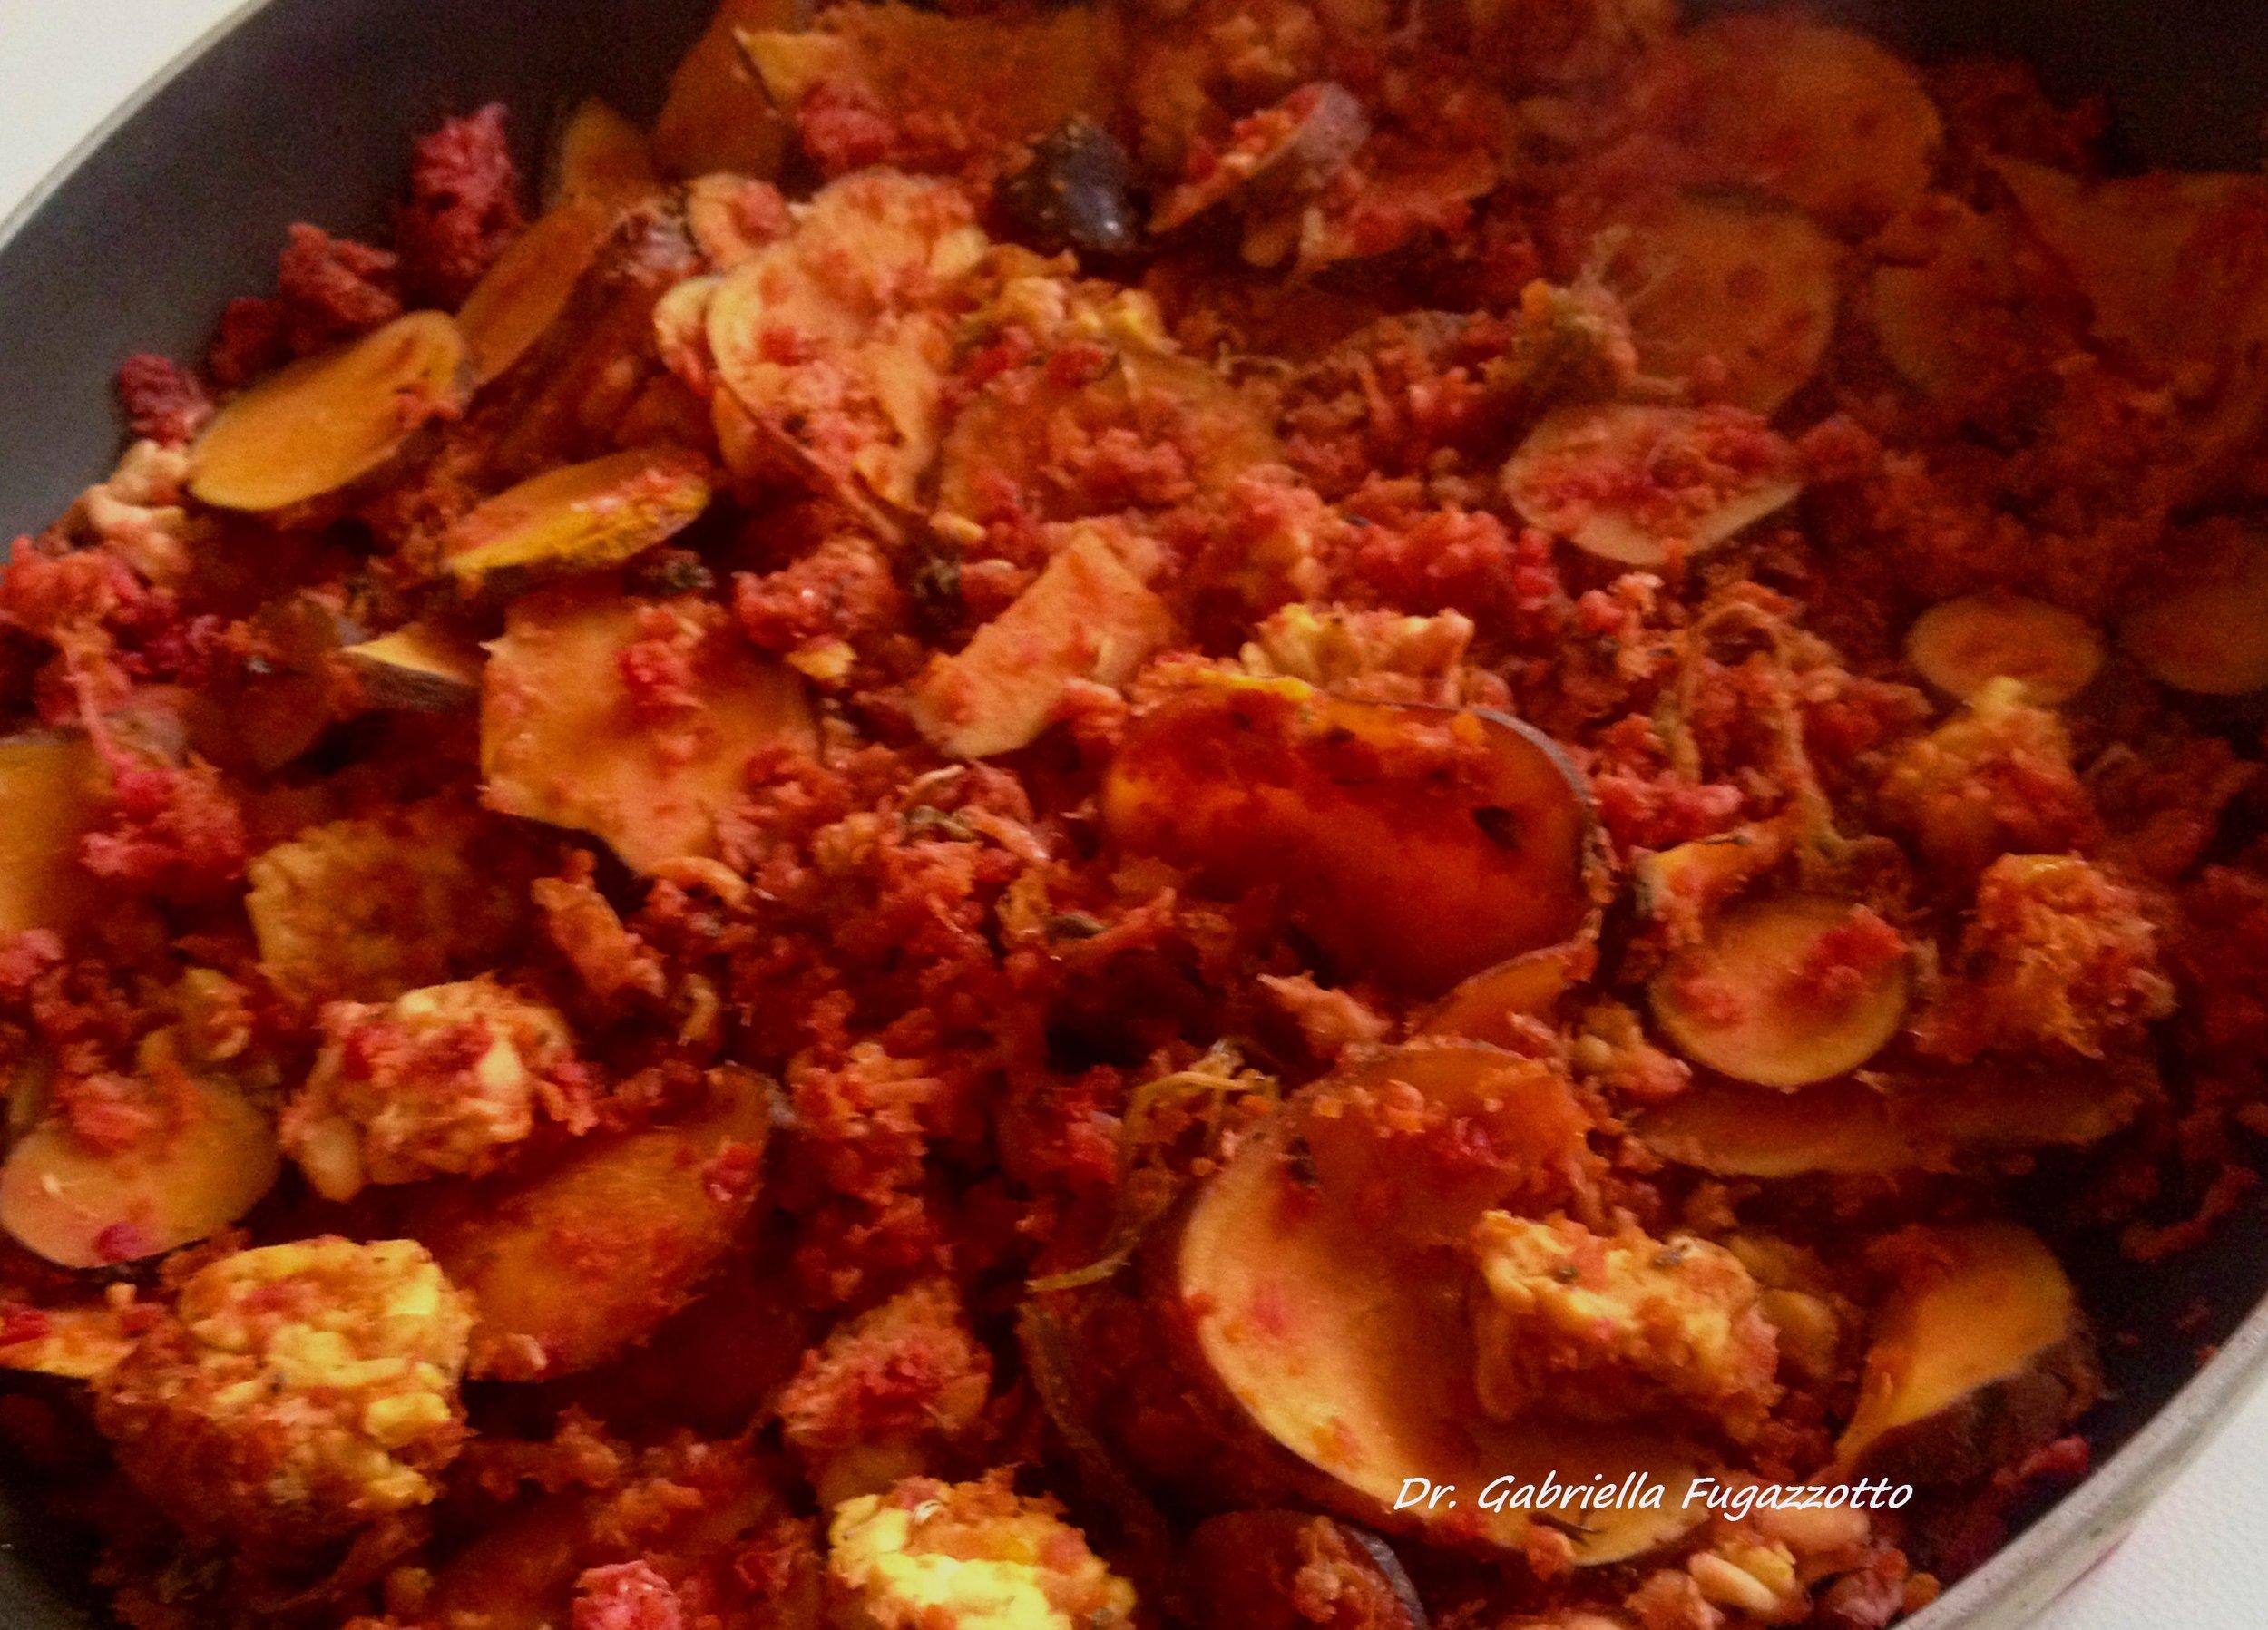 tempeh-scarti di estrattore-patate dolci-batata.jpg